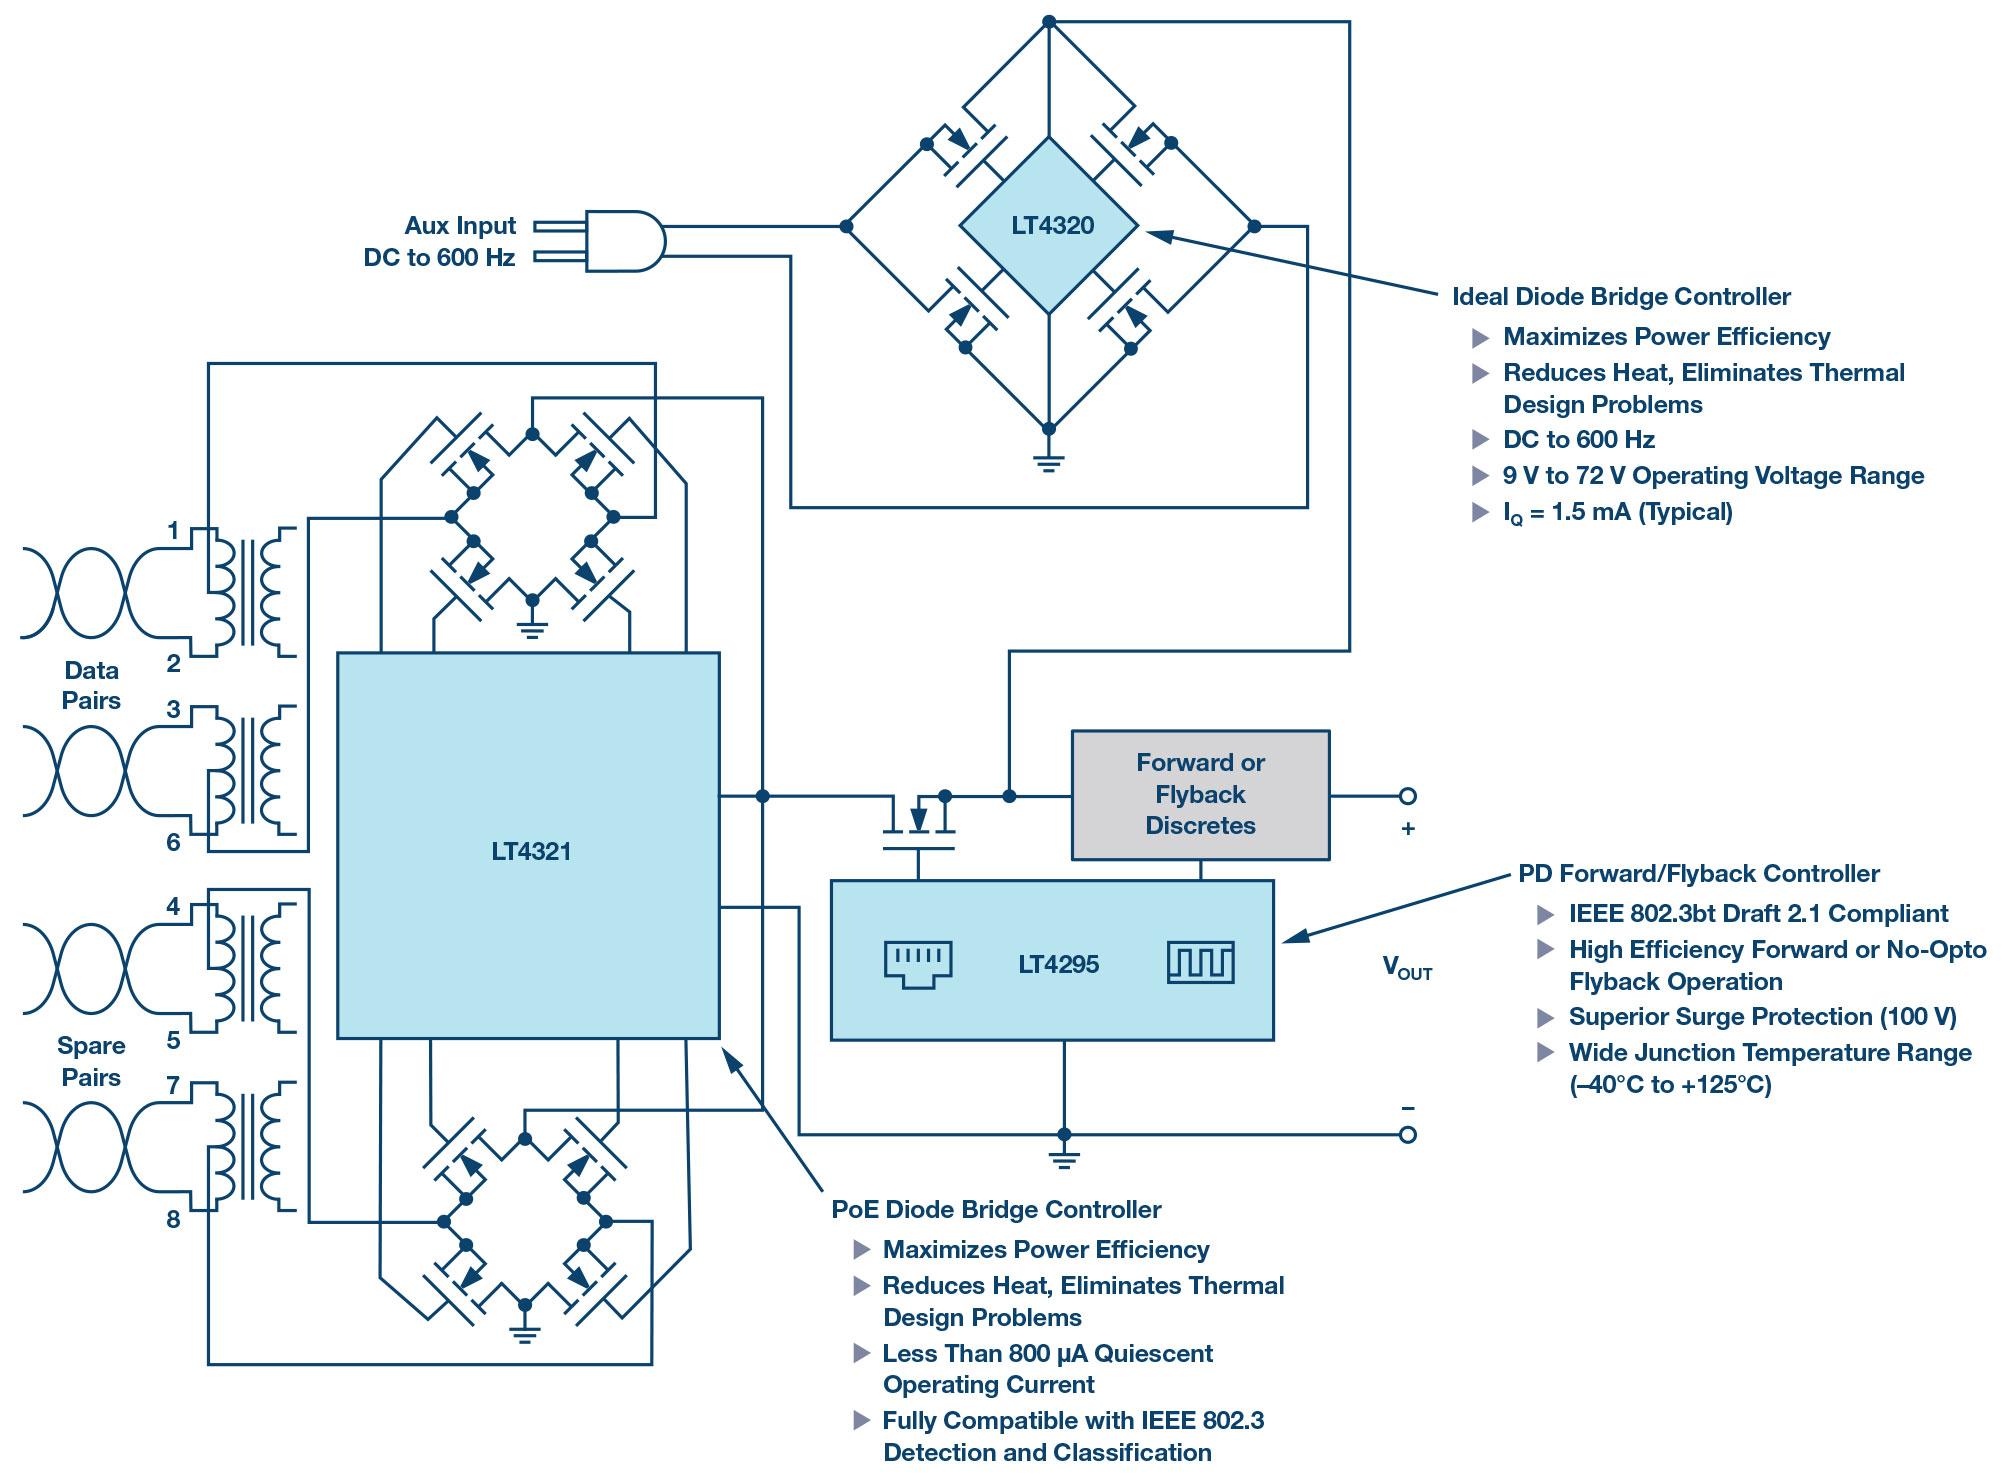 hight resolution of figure 71 power supply block diagrams wiring diagram data val figure 71 power supply block diagrams